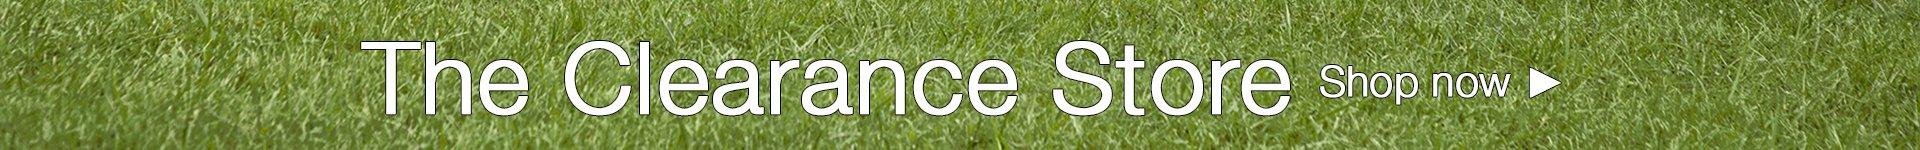 Amazon.com Patio Lawn Garden Clearance Store